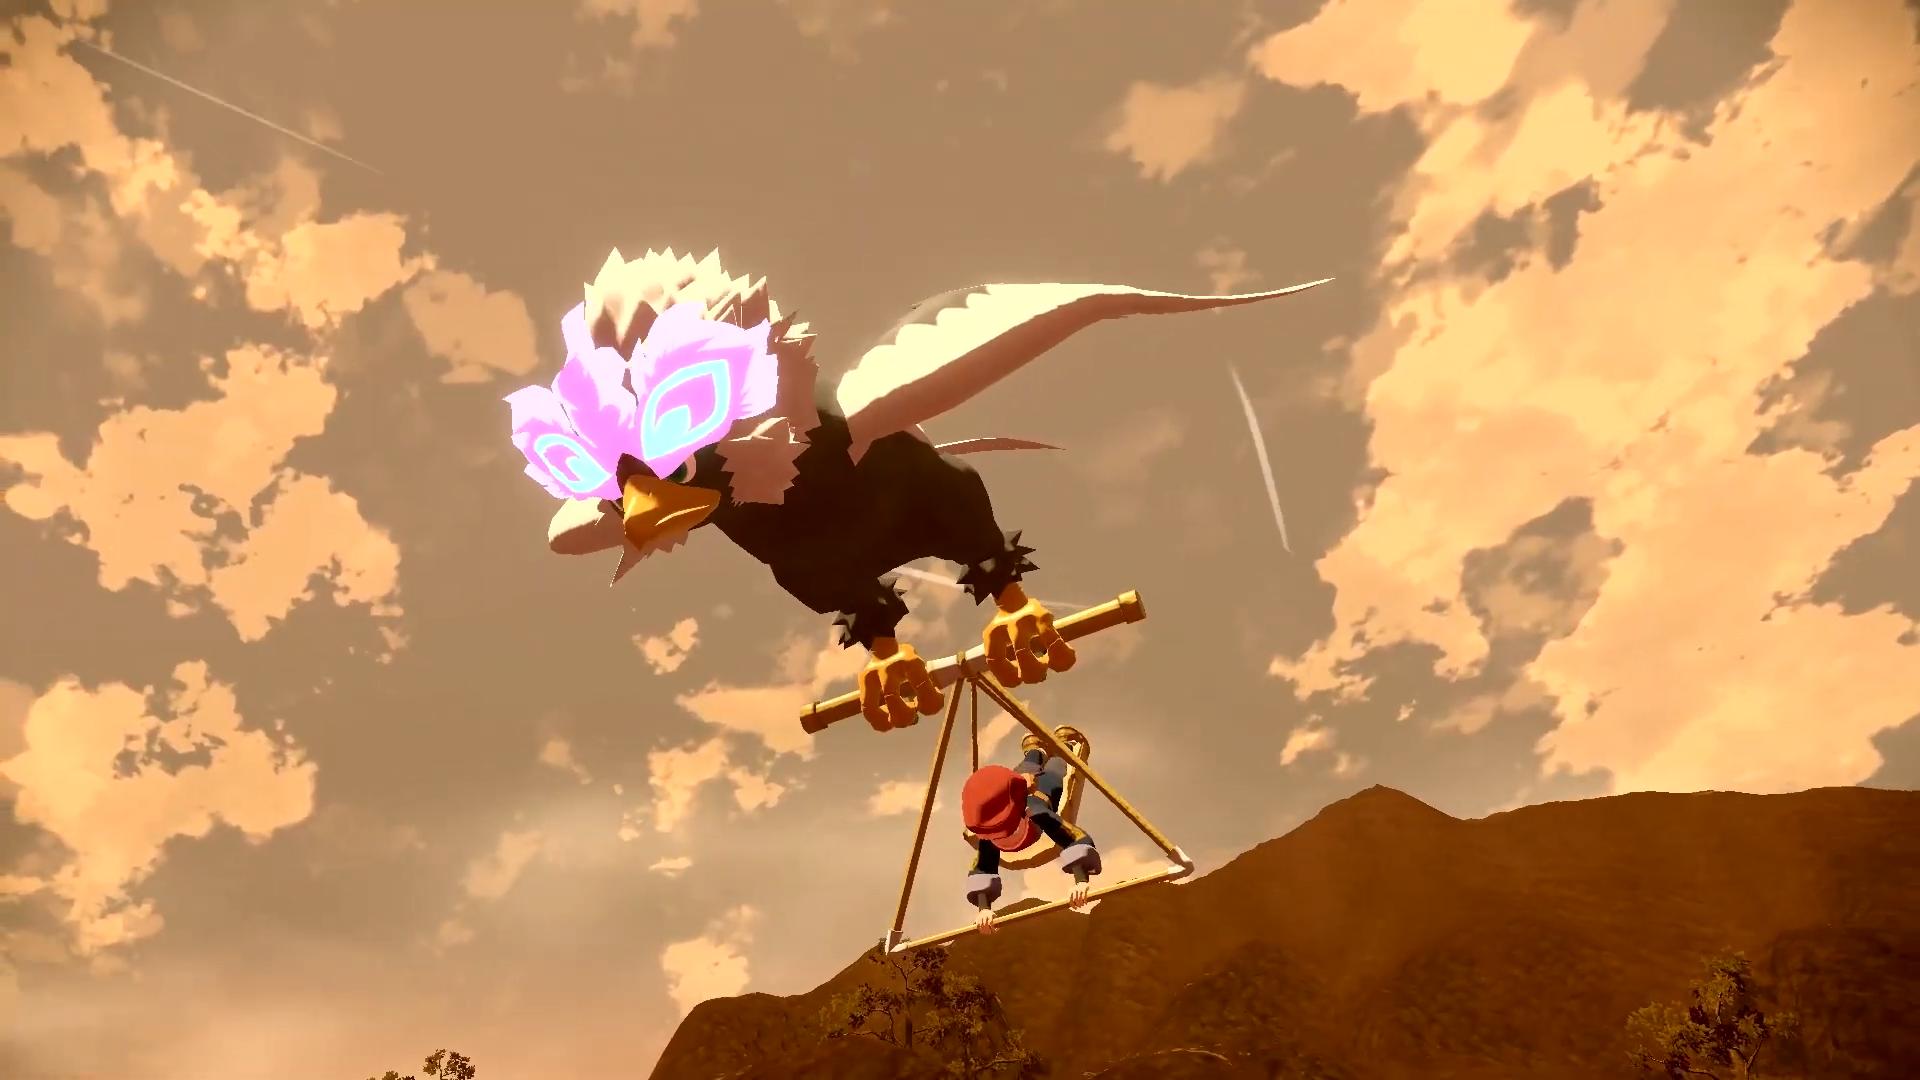 Новости о Pokemon: свежие трейлеры Arceus и Brilliant Diamond & Shining Pearl, дата релиза Unite на телефонах и перезапуск Cafe Mix